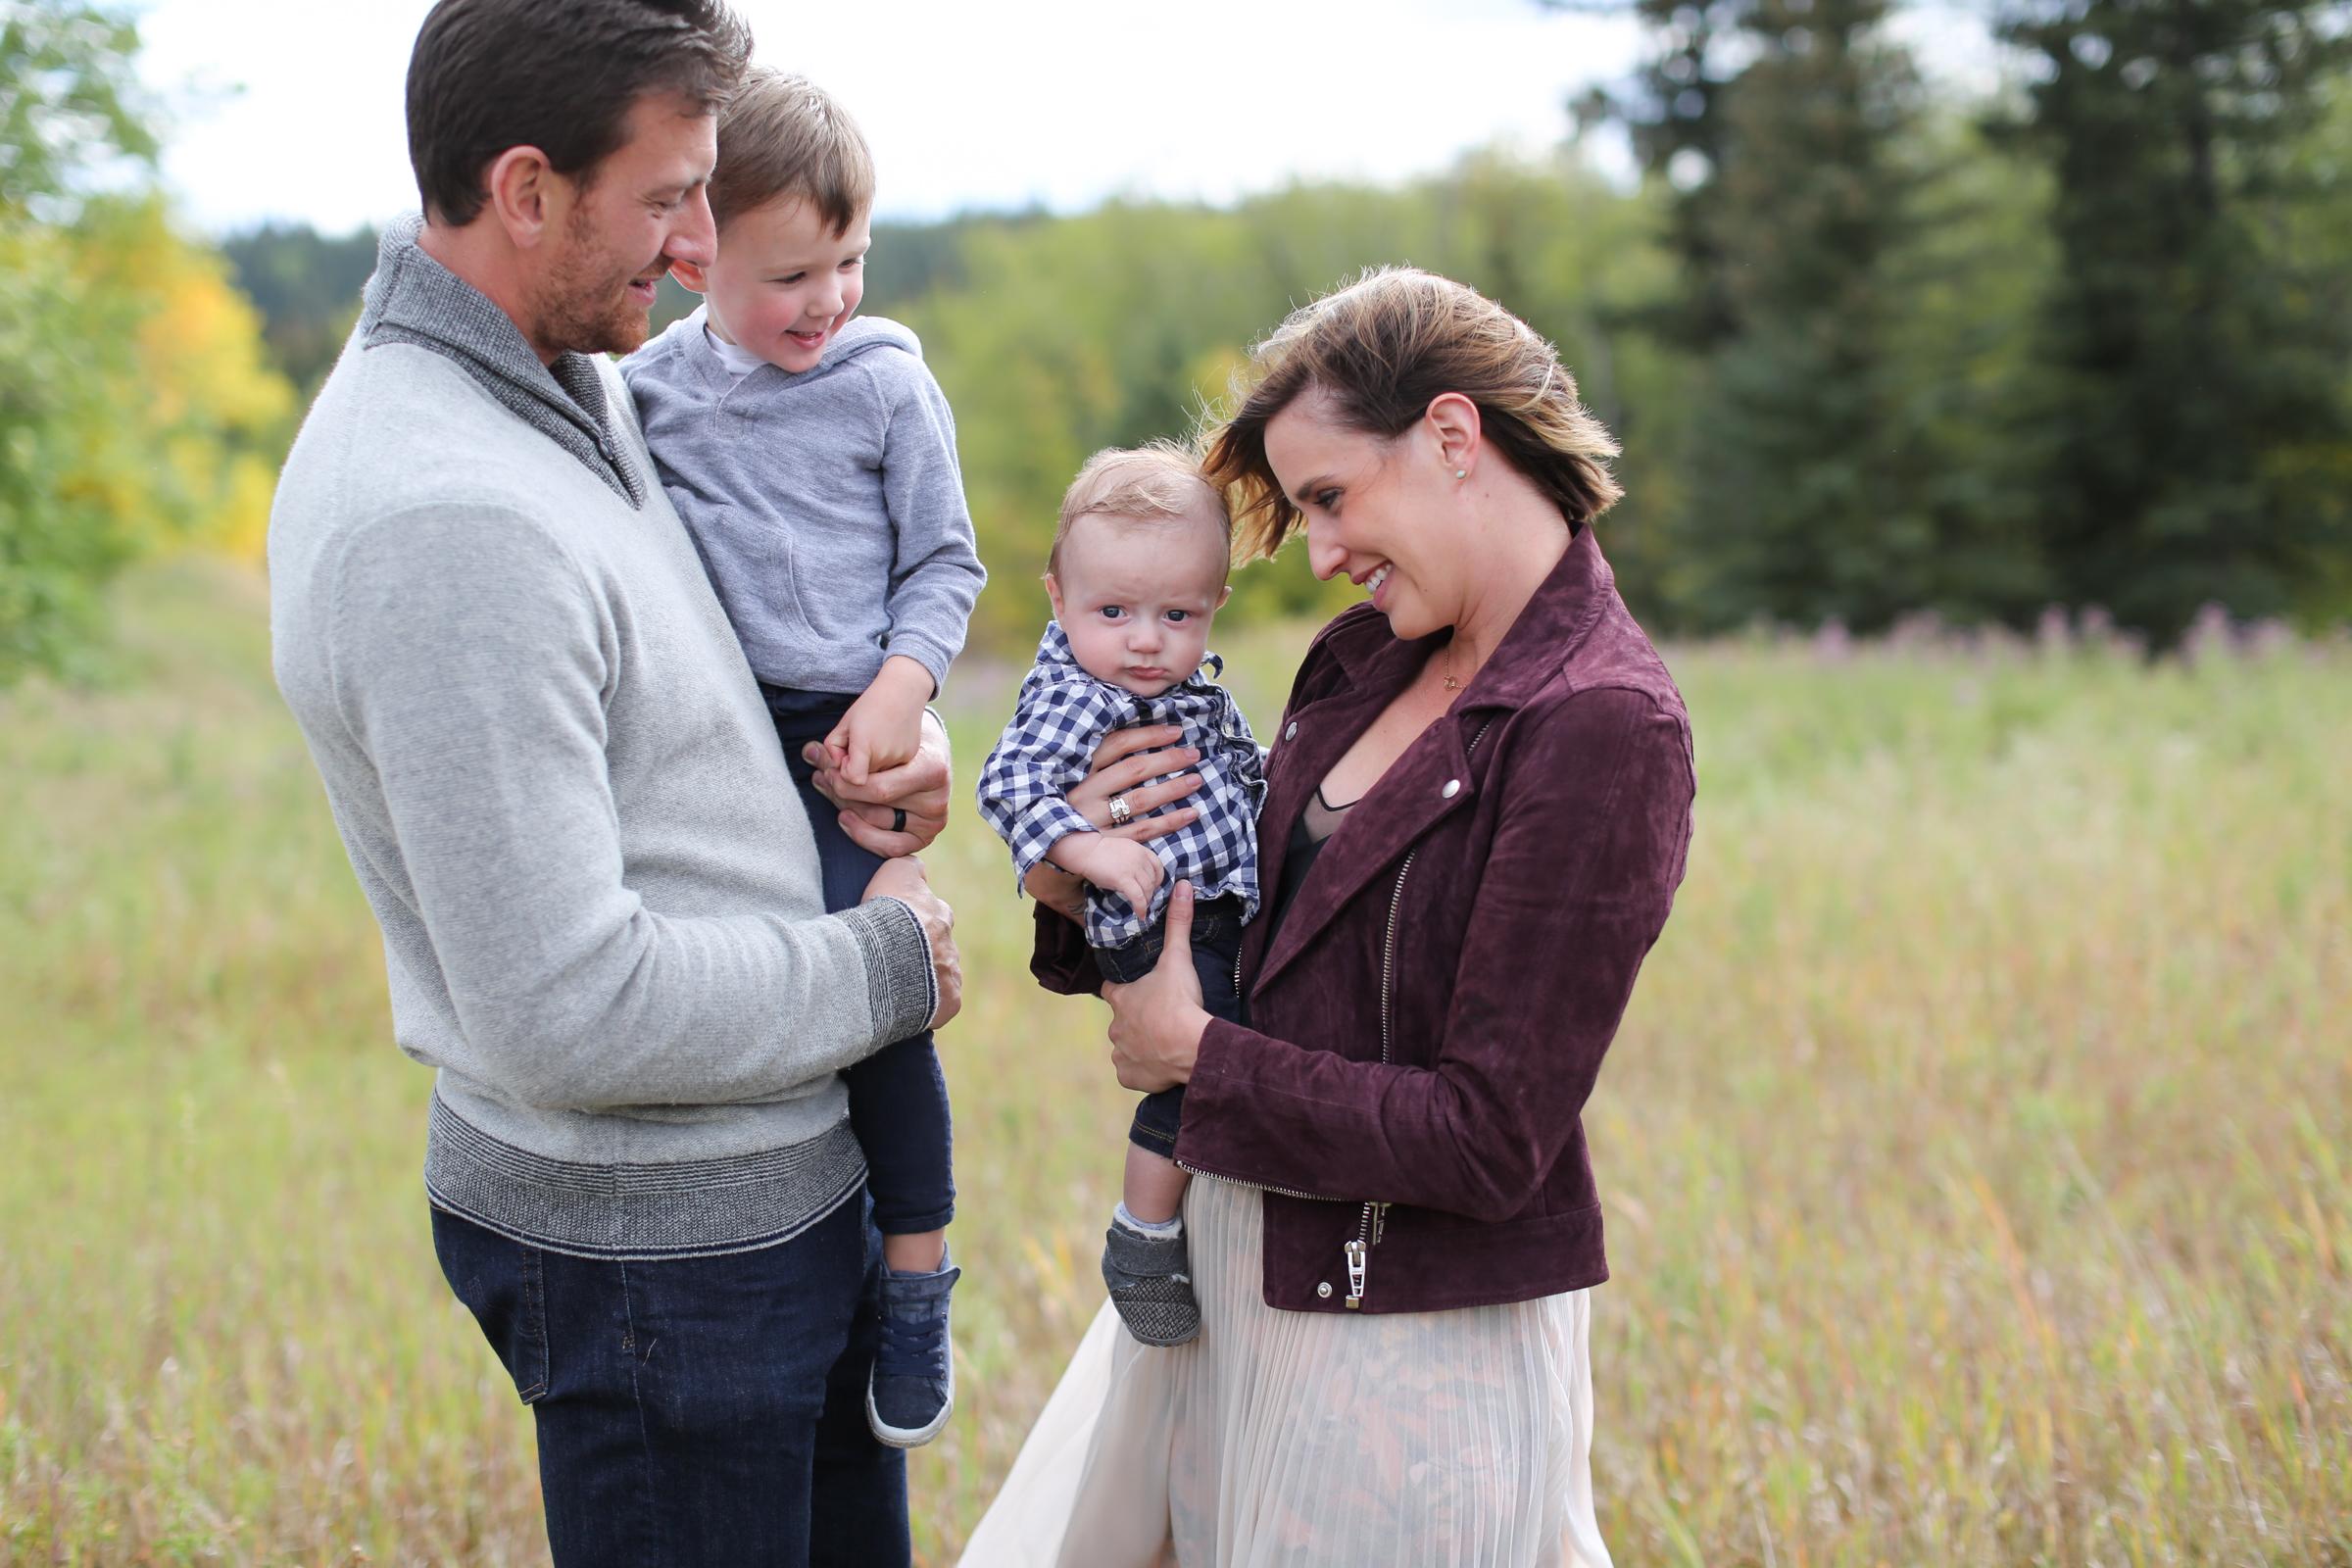 Fall-Family-Creative-Lindsay_Skeans_Photography-32.jpg